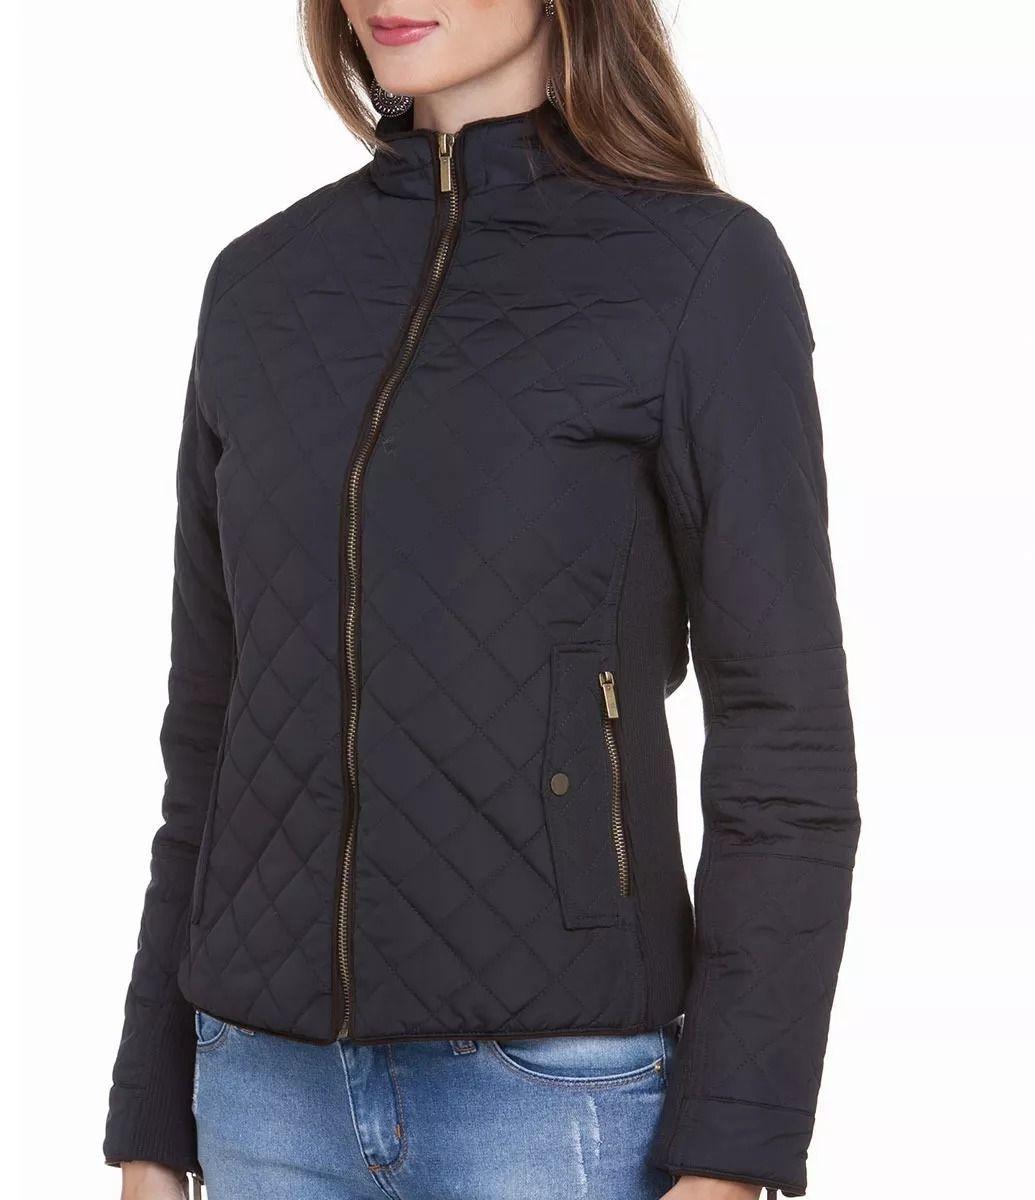 e55d8ec9361 jaqueta casaco feminina matelasse forrada semi-impermeável